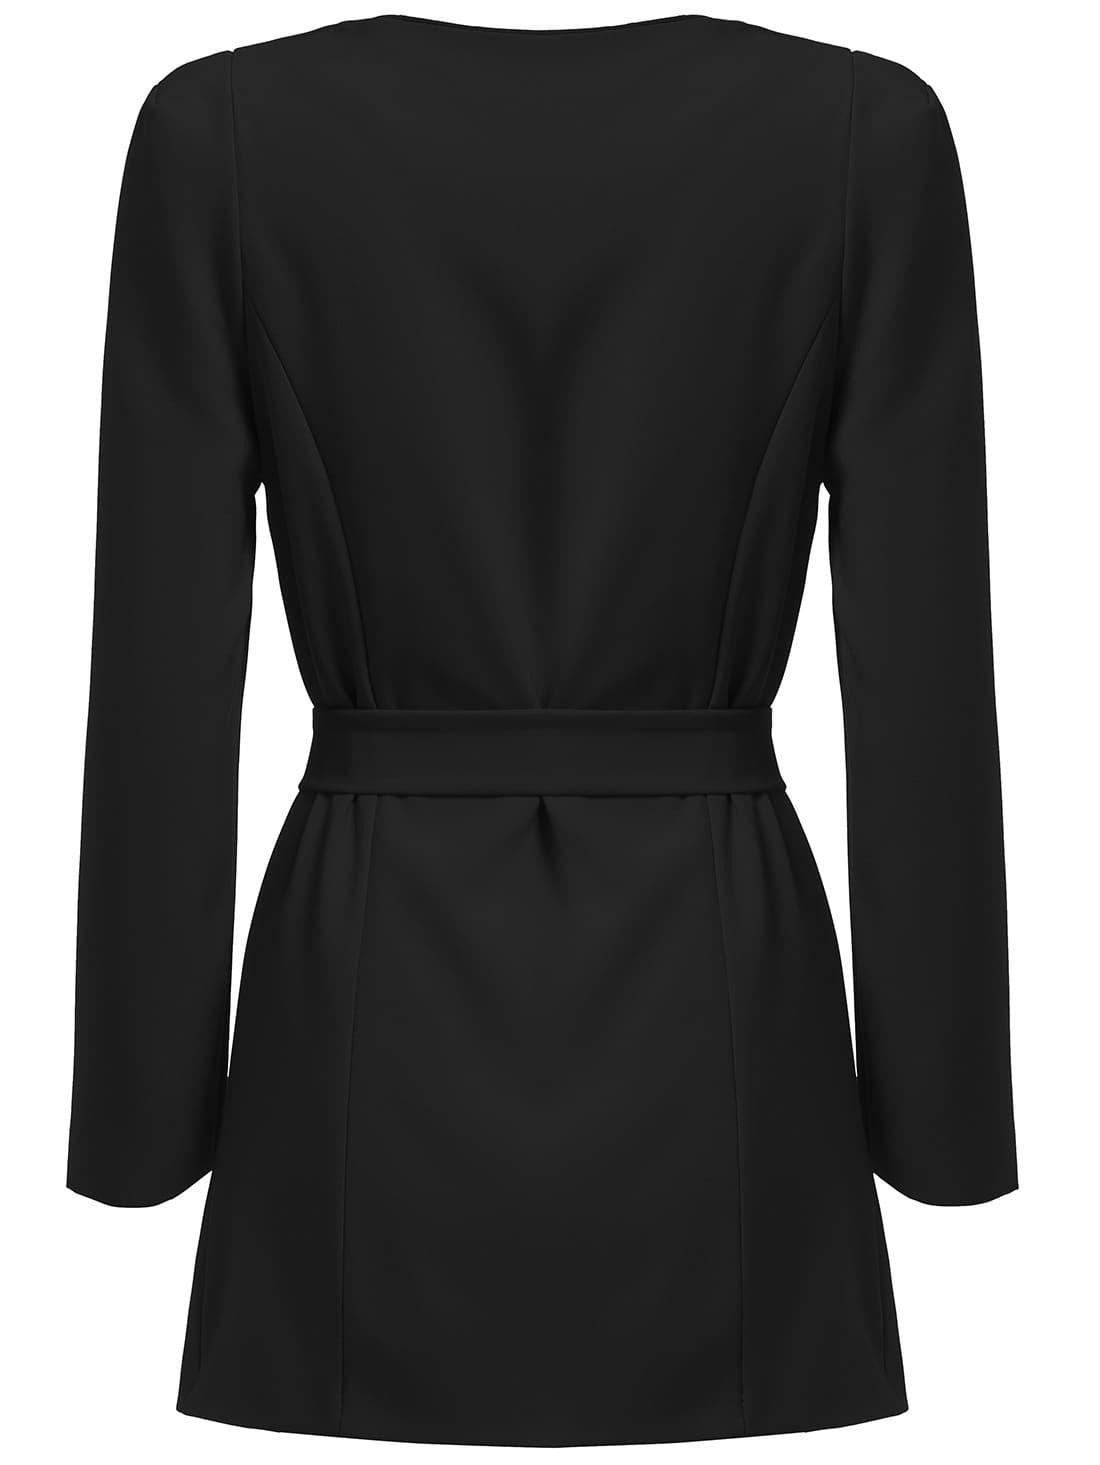 Zara picked for Sleeveless High Waist V Neck Dress boutique business plan